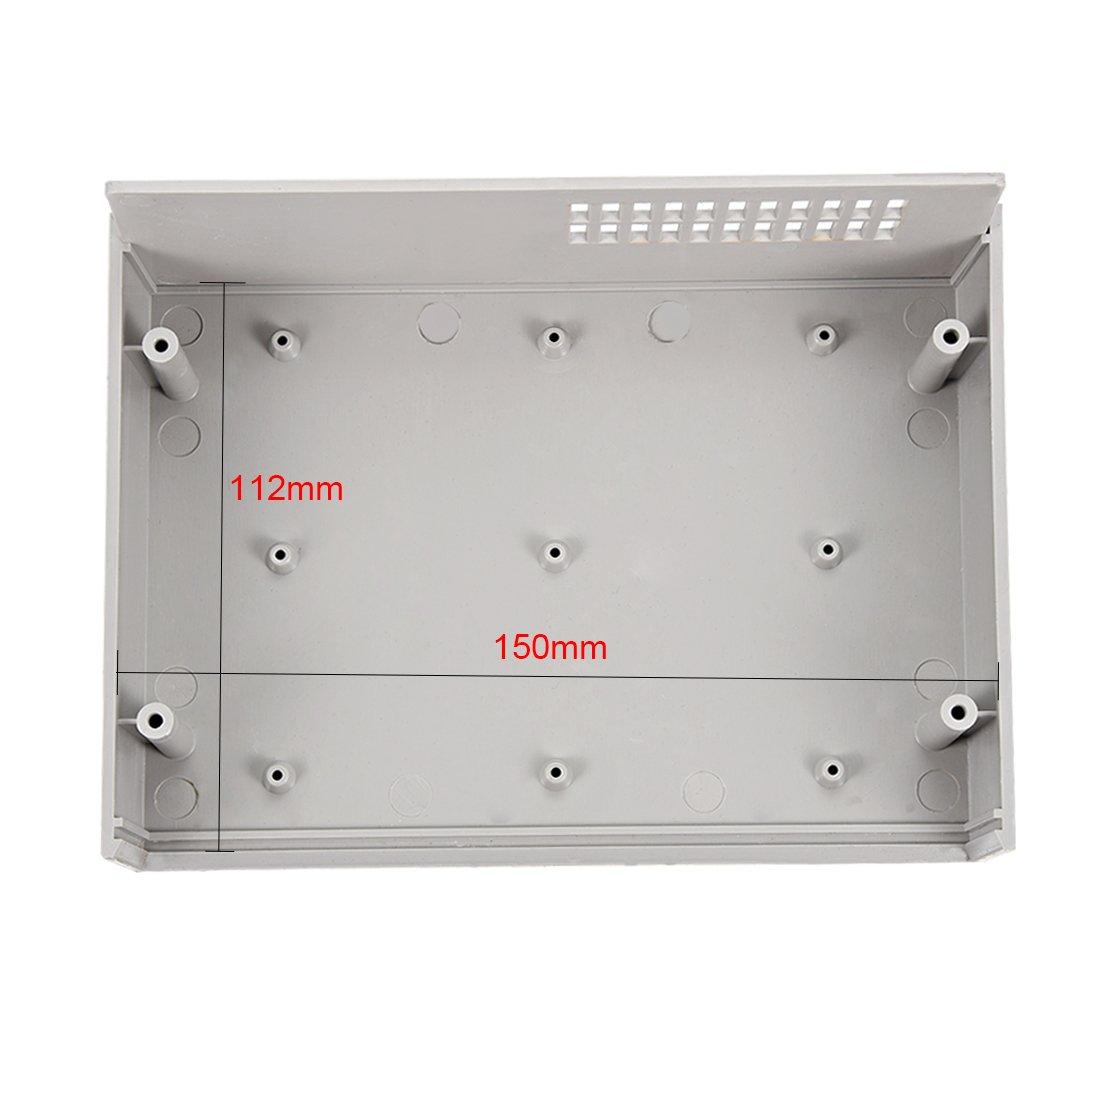 sourcingmap 200 x 155 x 65mm Electronic Plastic DIY Junction Box Enclosure Case Off White